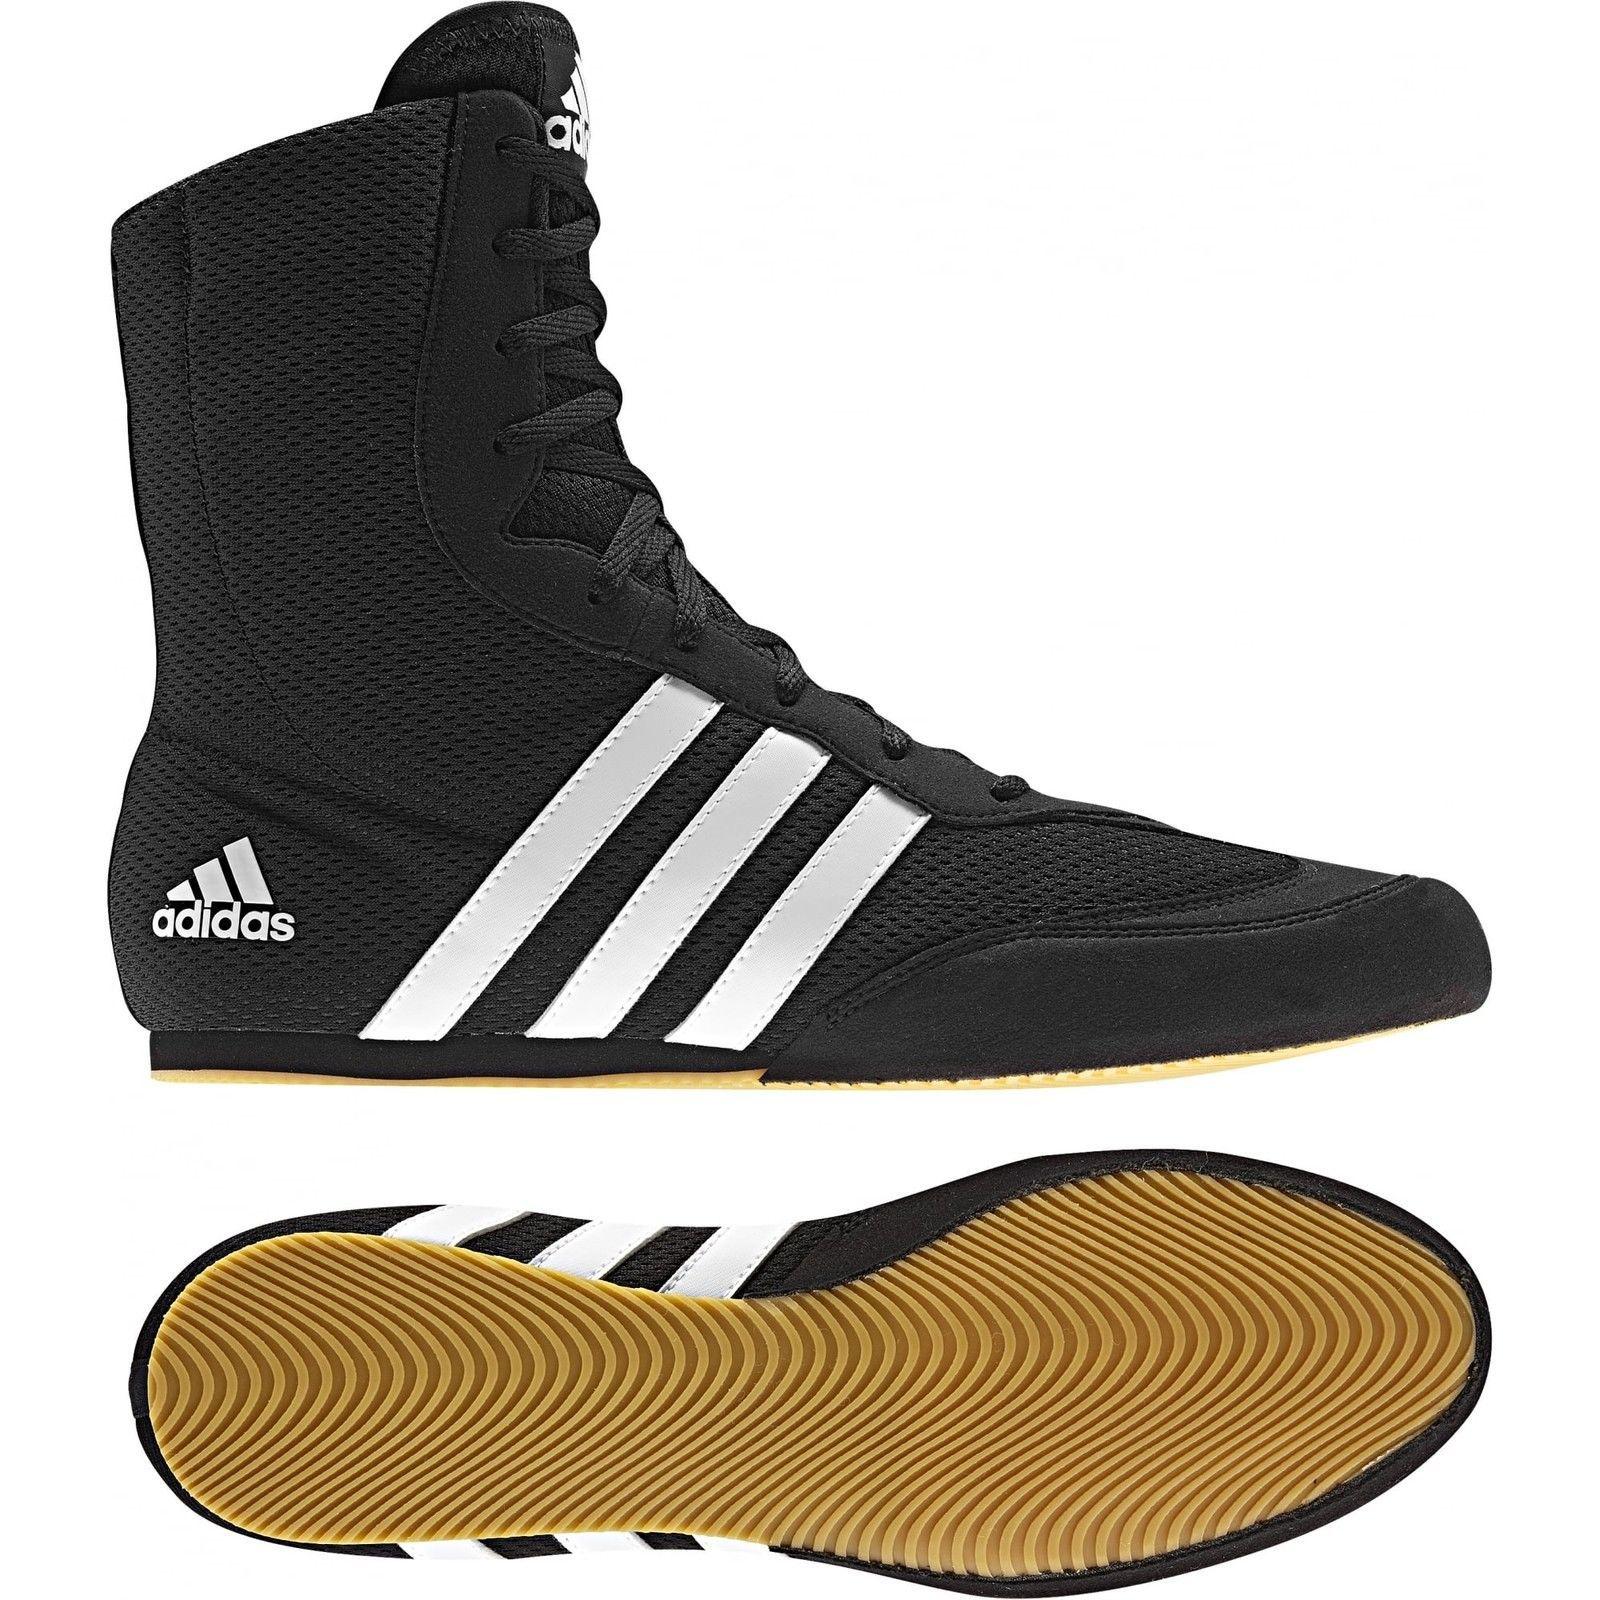 Adidas Box Hog Boxing Boots Kids & Adults - Black